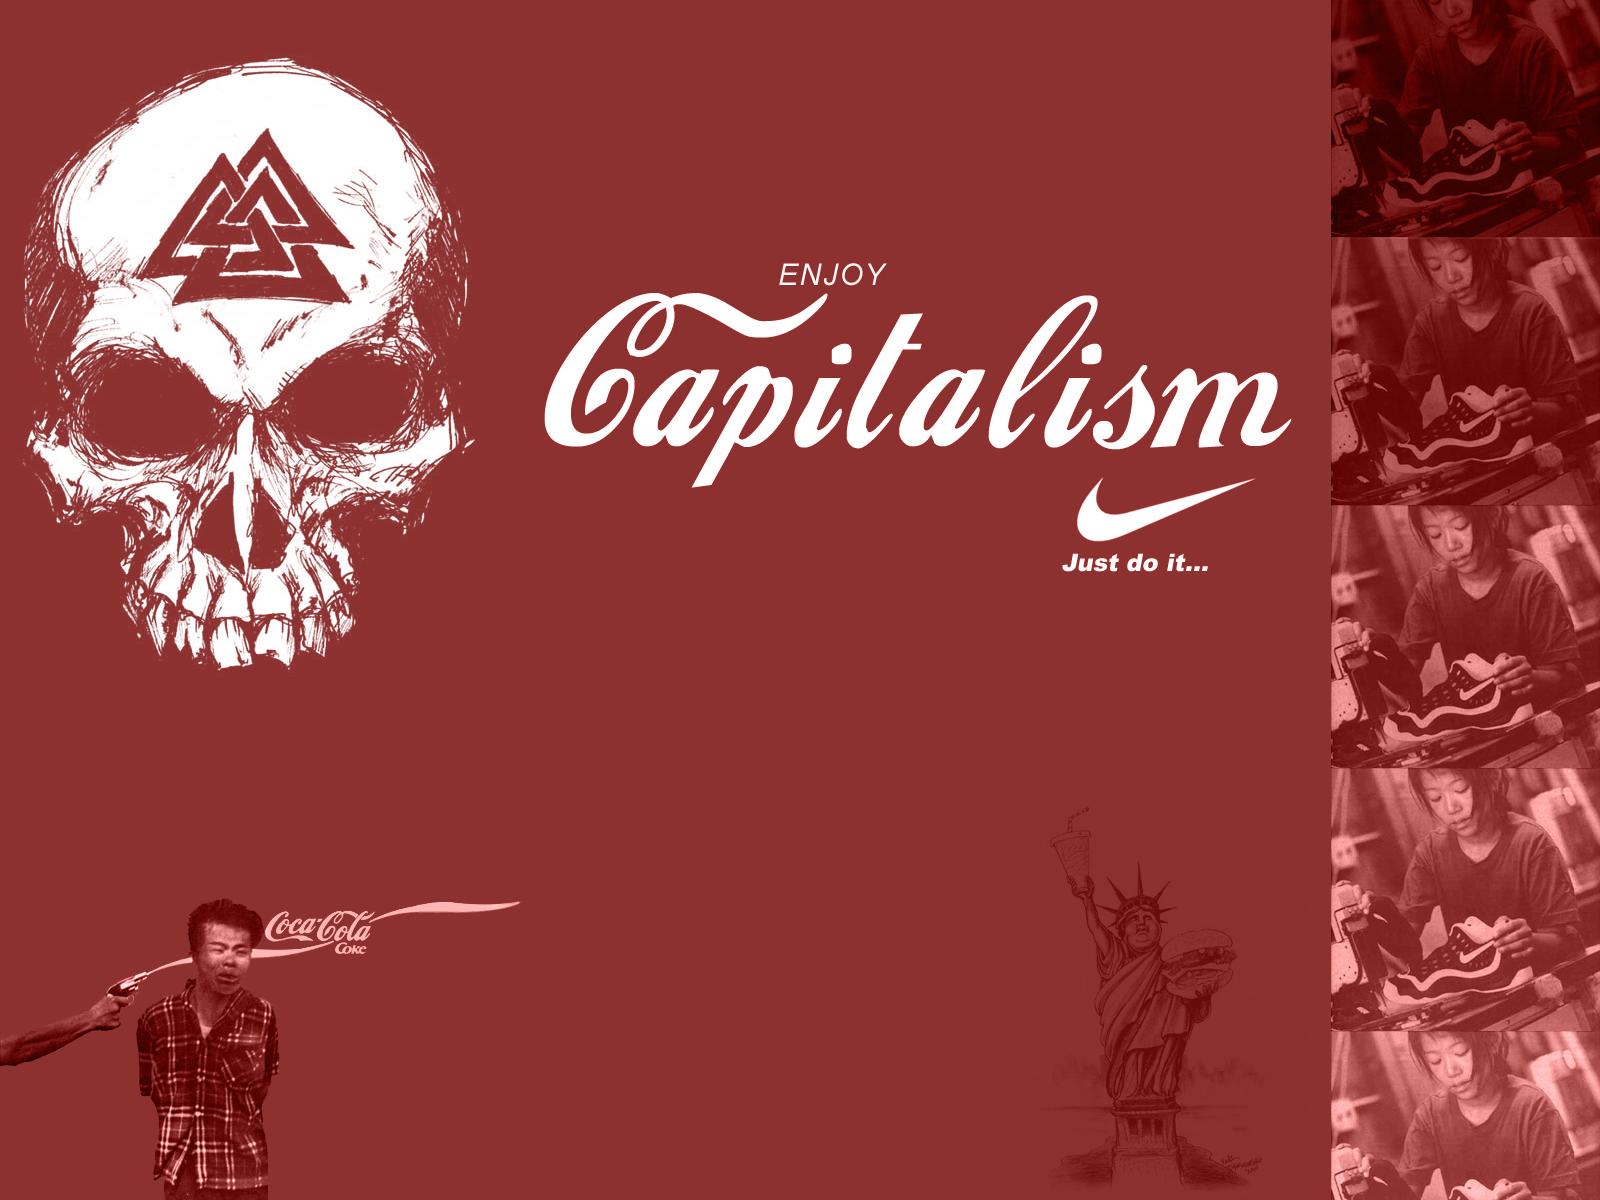 Enjoy capitalism by diabloburn on deviantart